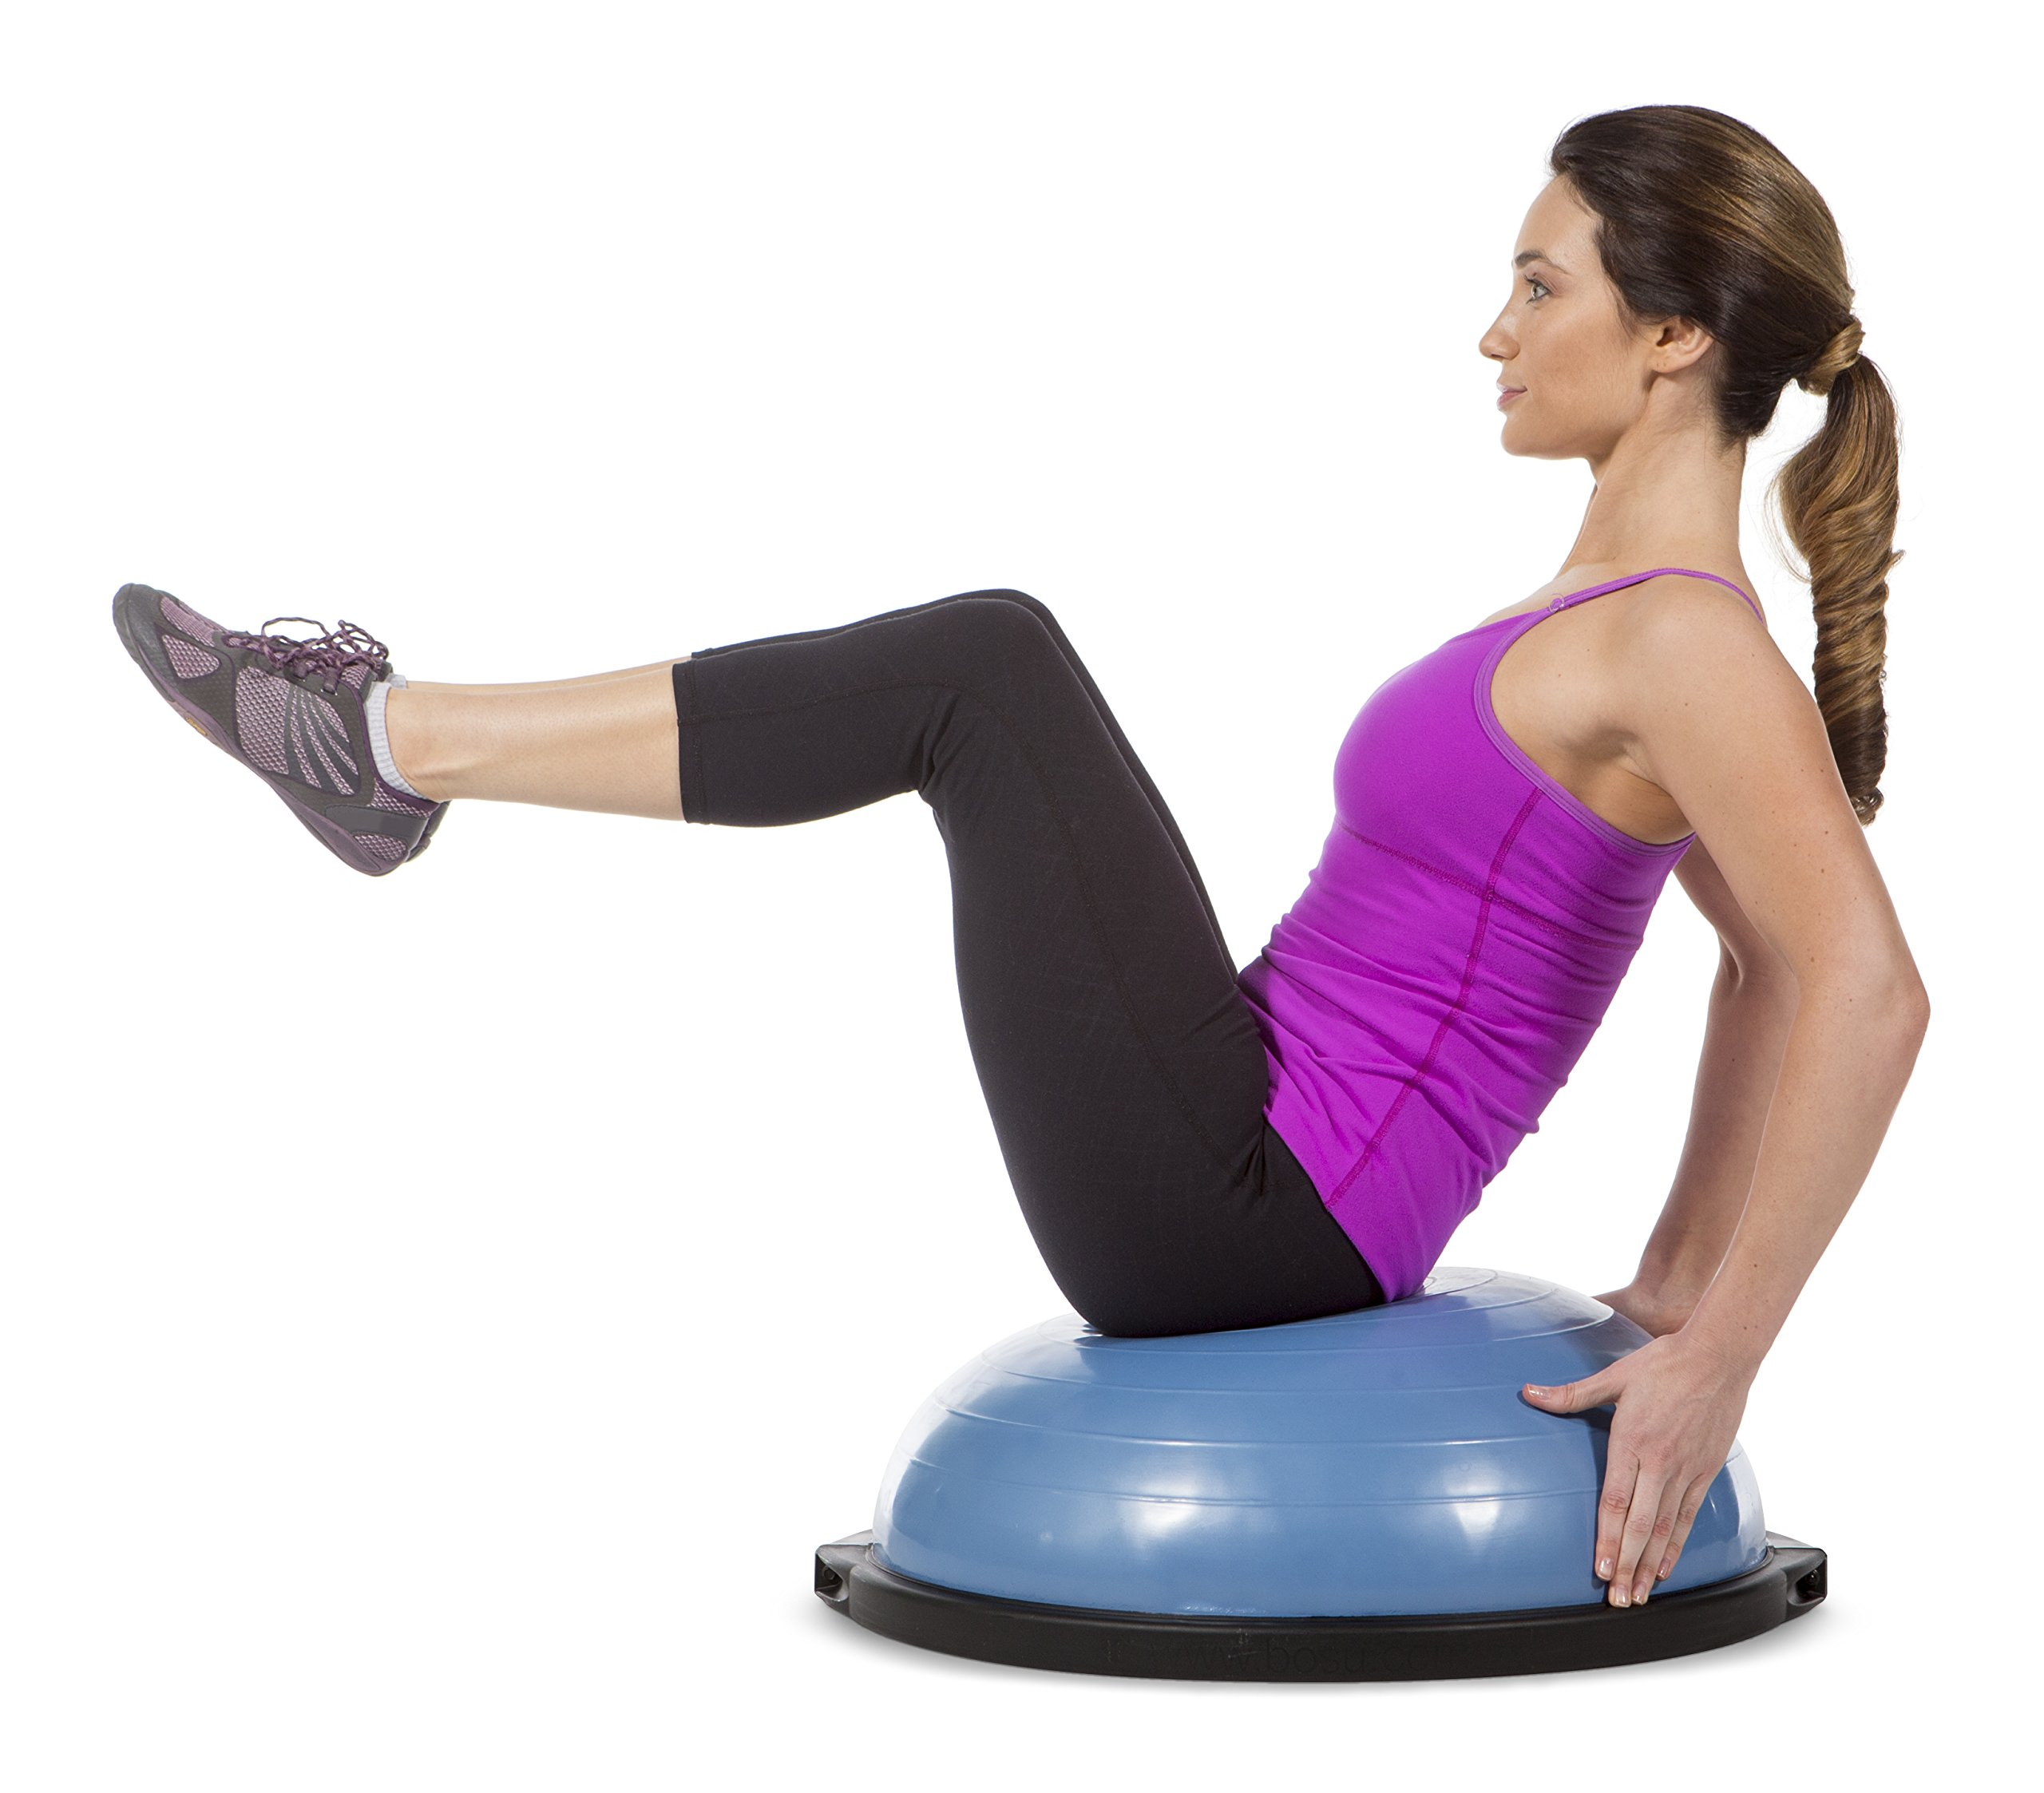 Bosu Balance Trainer, 65cm The Original - Blue/Green by Bosu (Image #3)